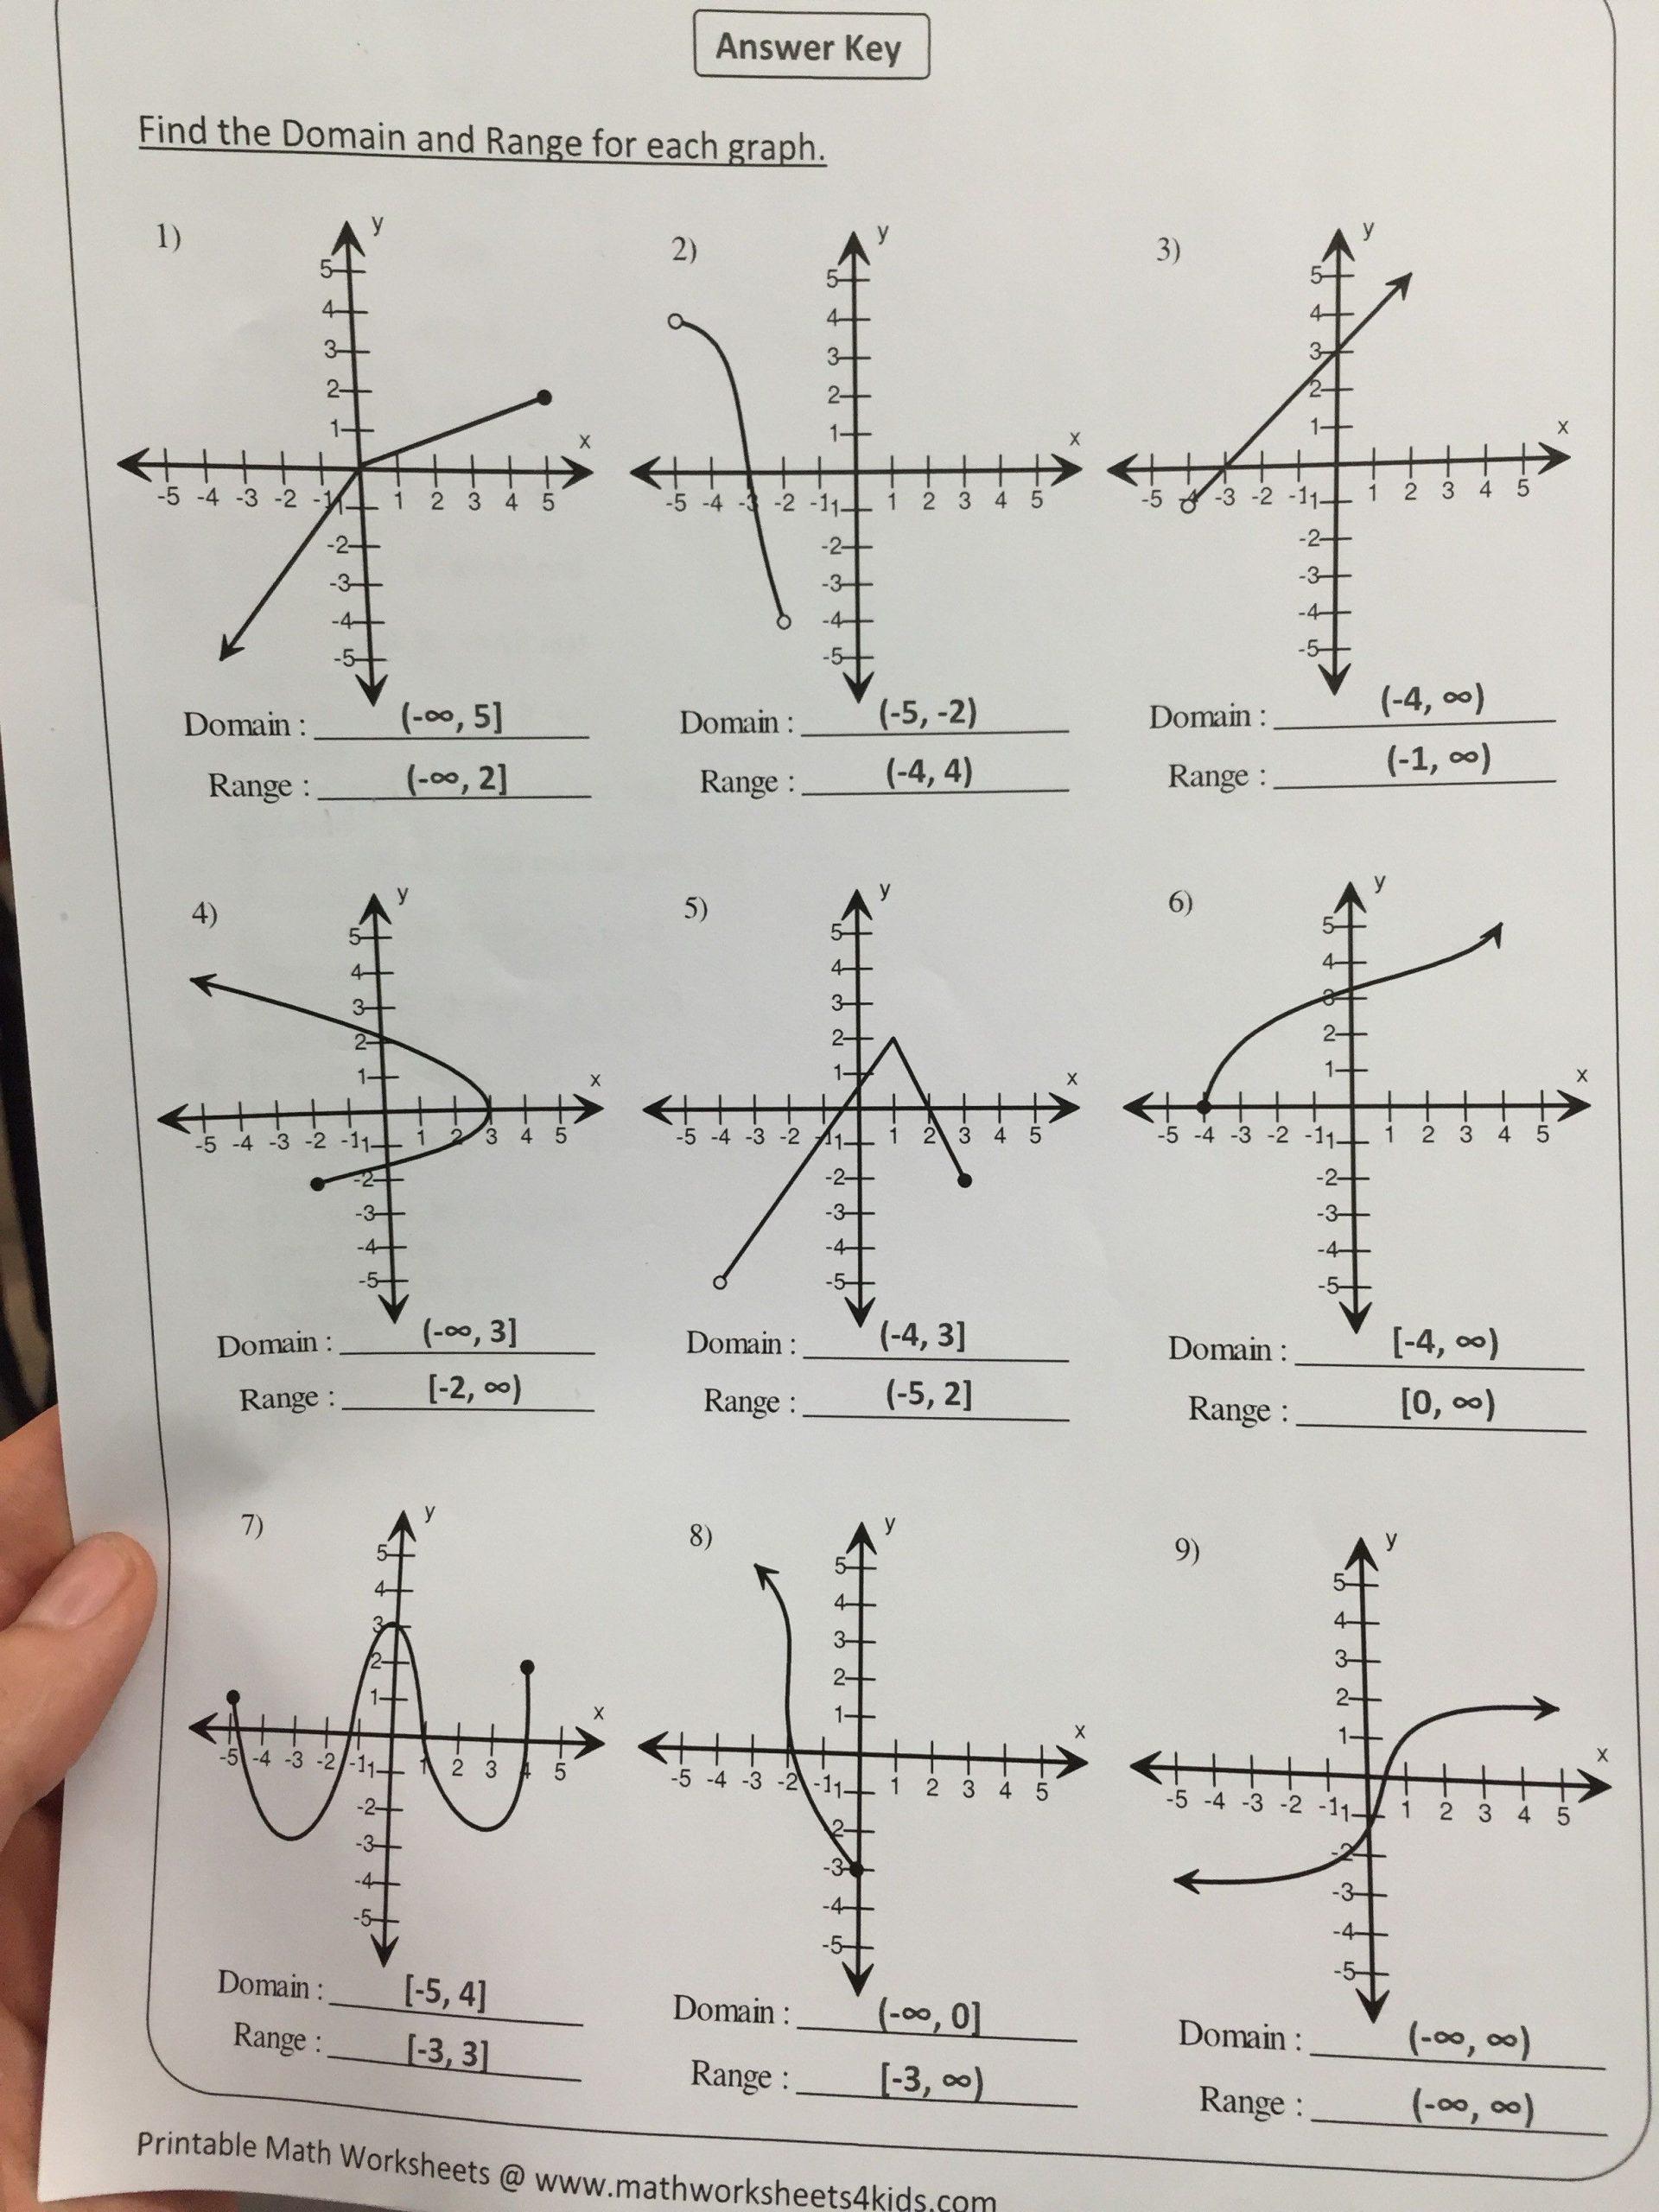 Domain and Range Worksheet 1 General Domain and Range Worksheet Algebra 1